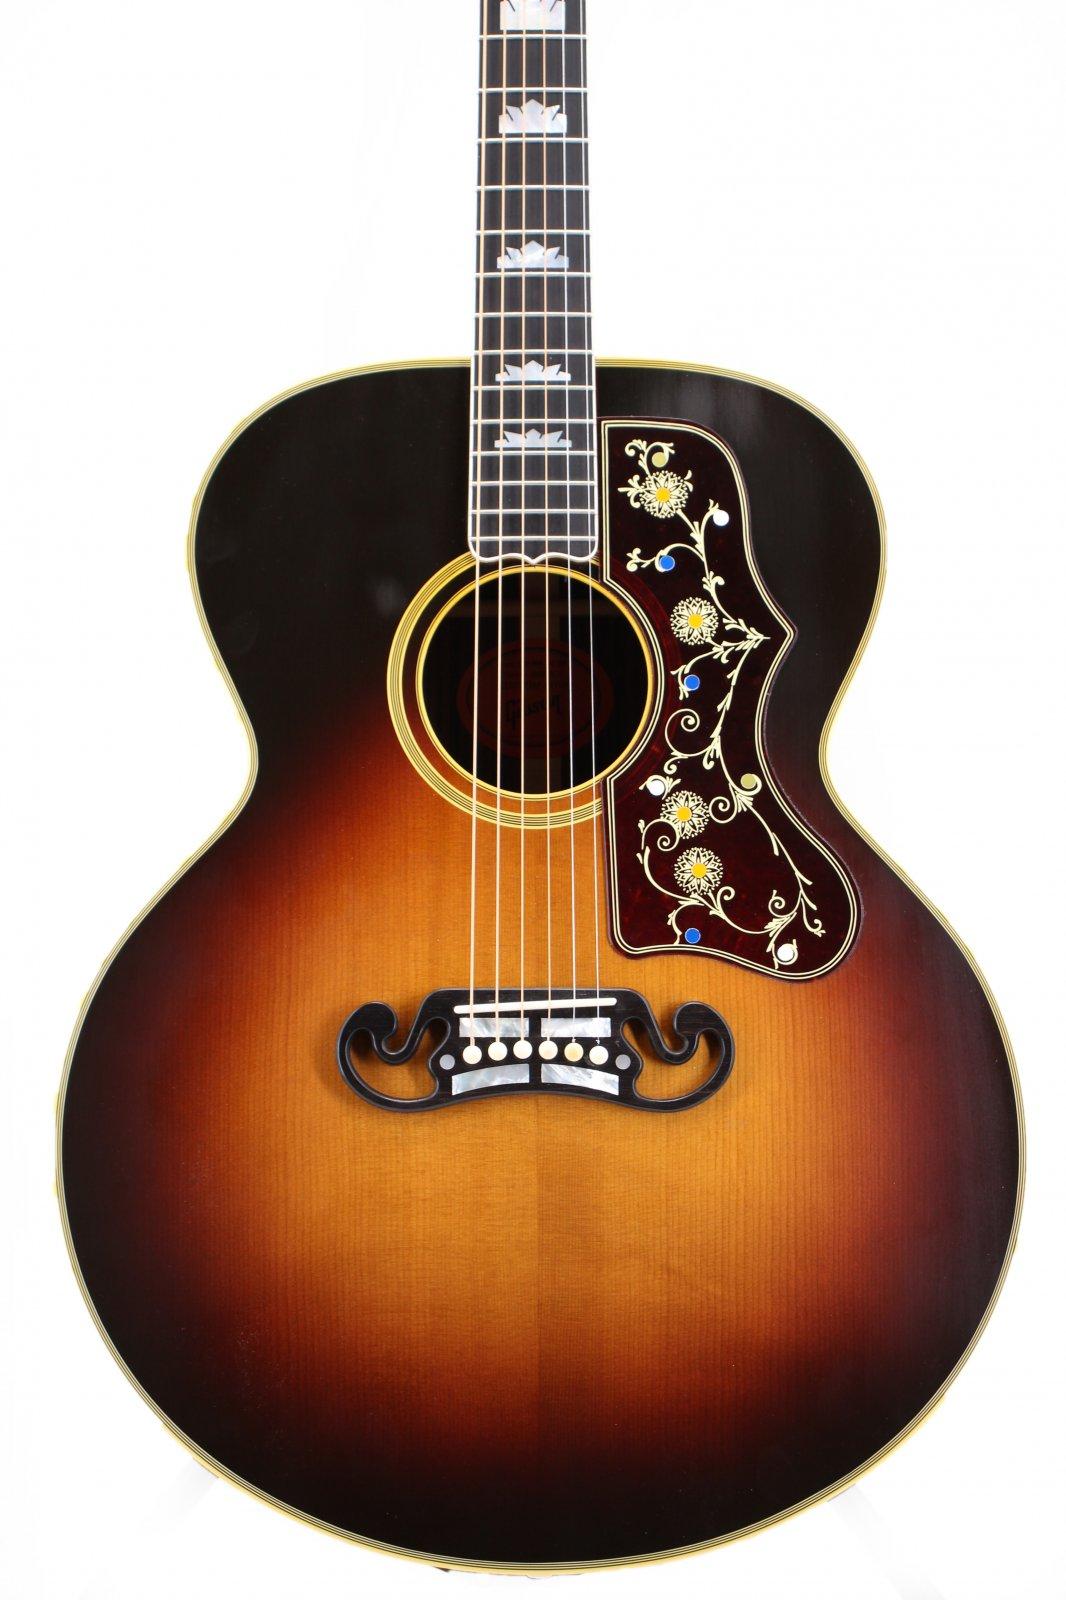 Gibson Pre-War SJ-200 Rosewood Thermal Aged Adirondack Top Jumbo Guitar